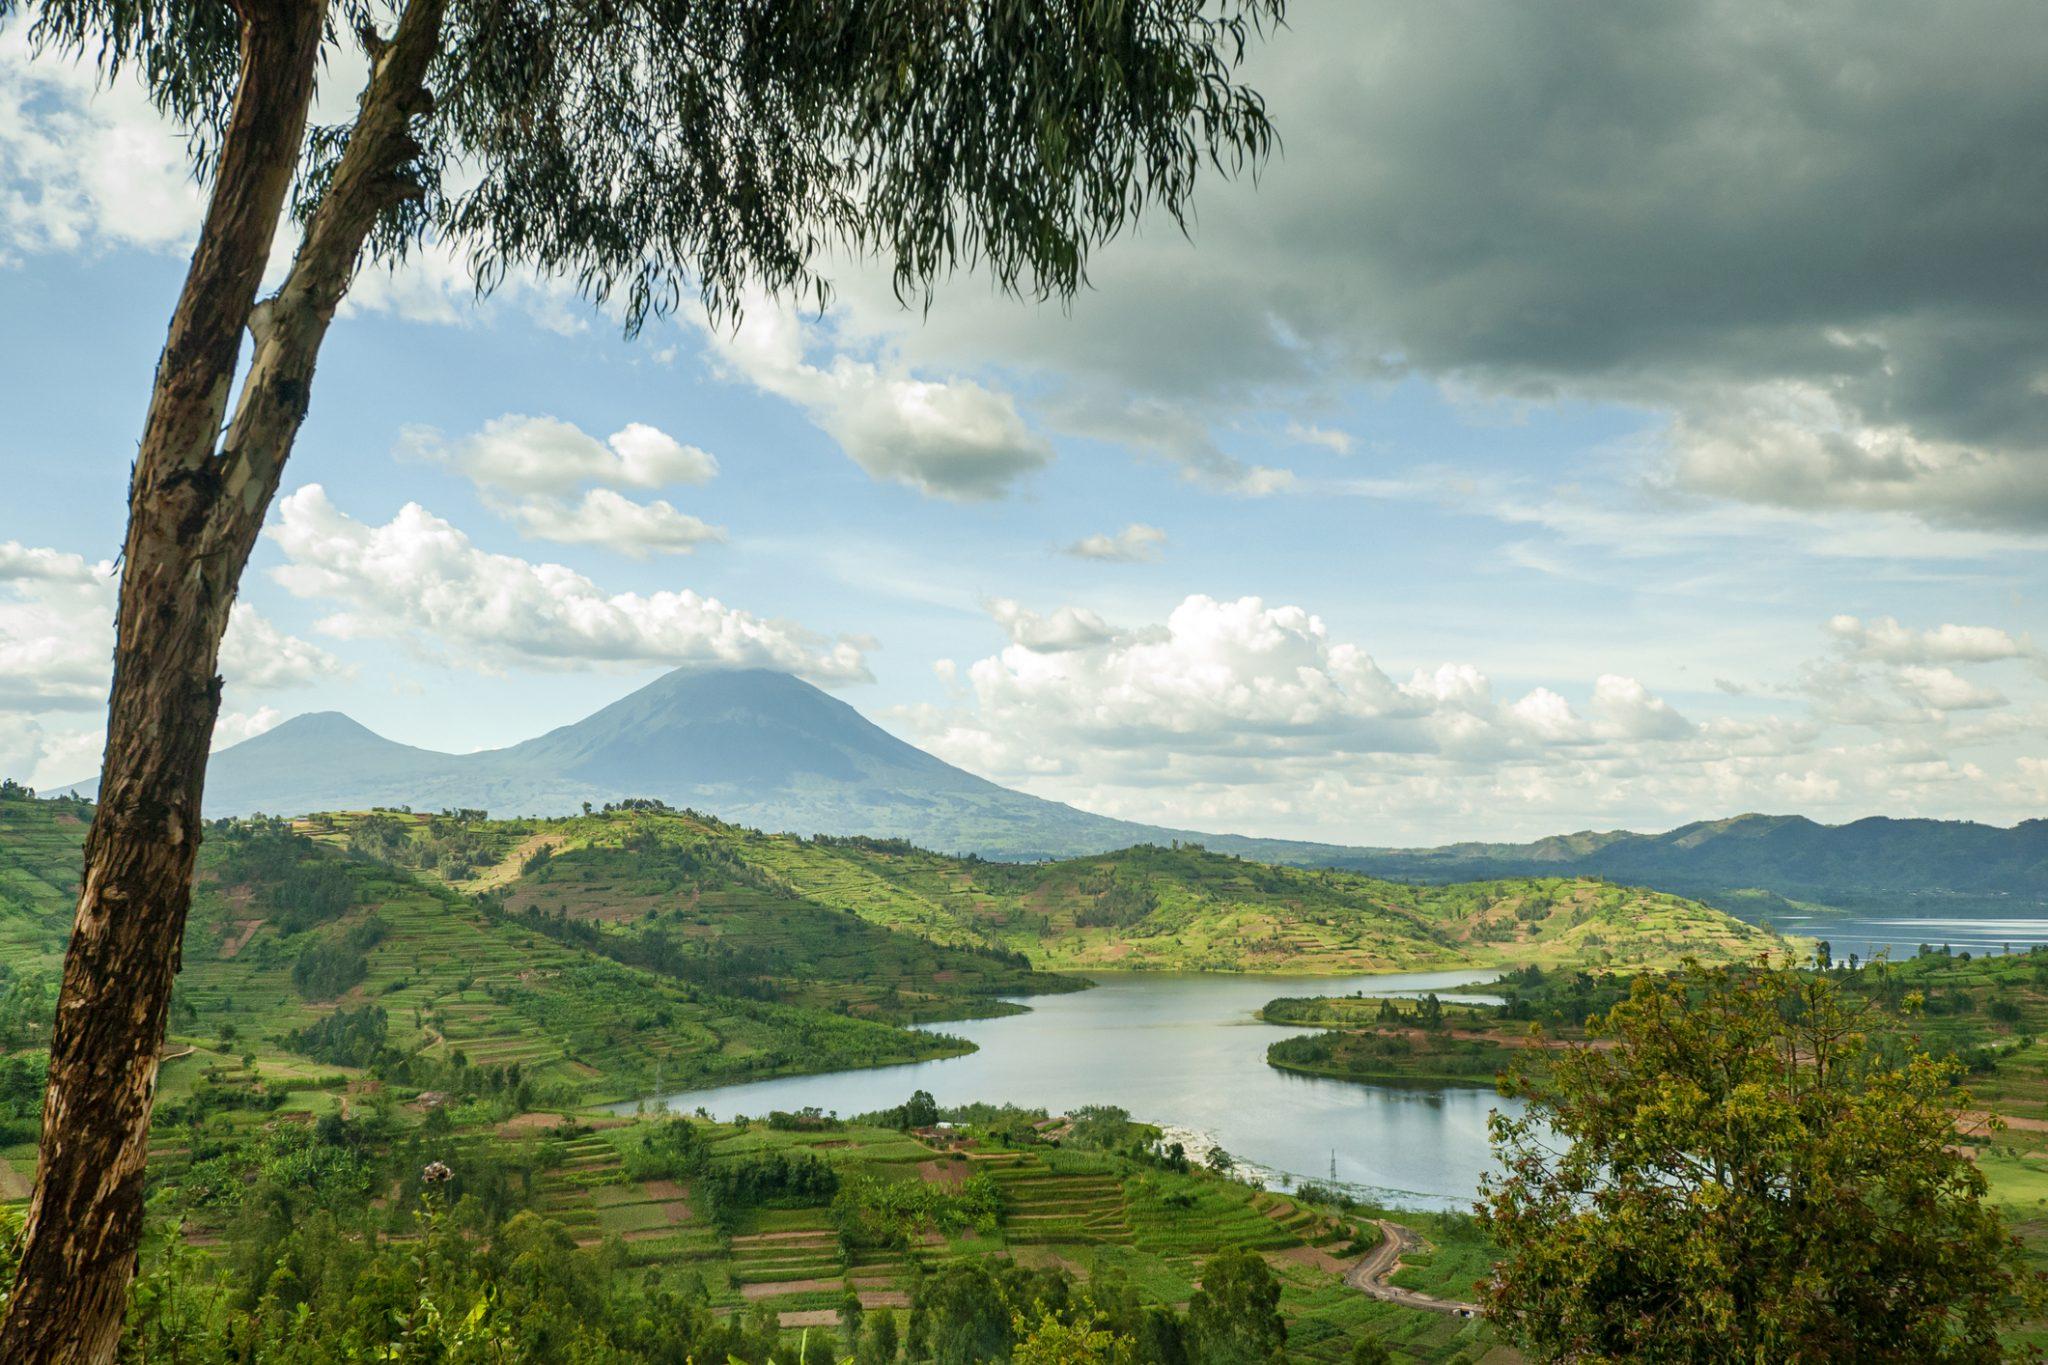 Landscape of the Virunga Mountains in Rwanda